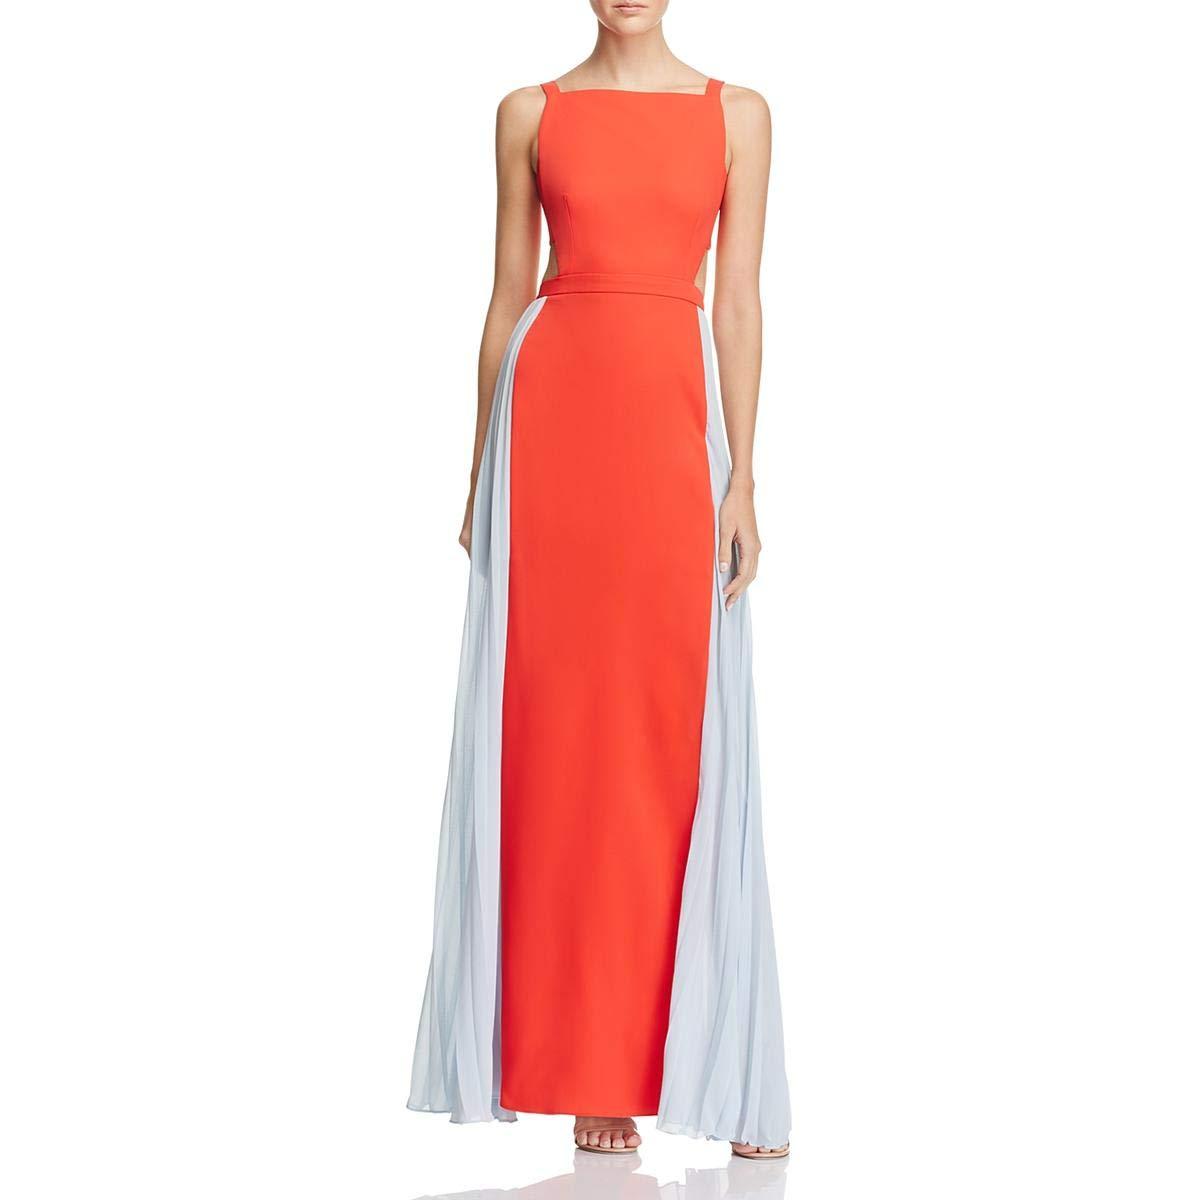 BCBGMAXAZRIA Womens Micaila Woven Evening Dress